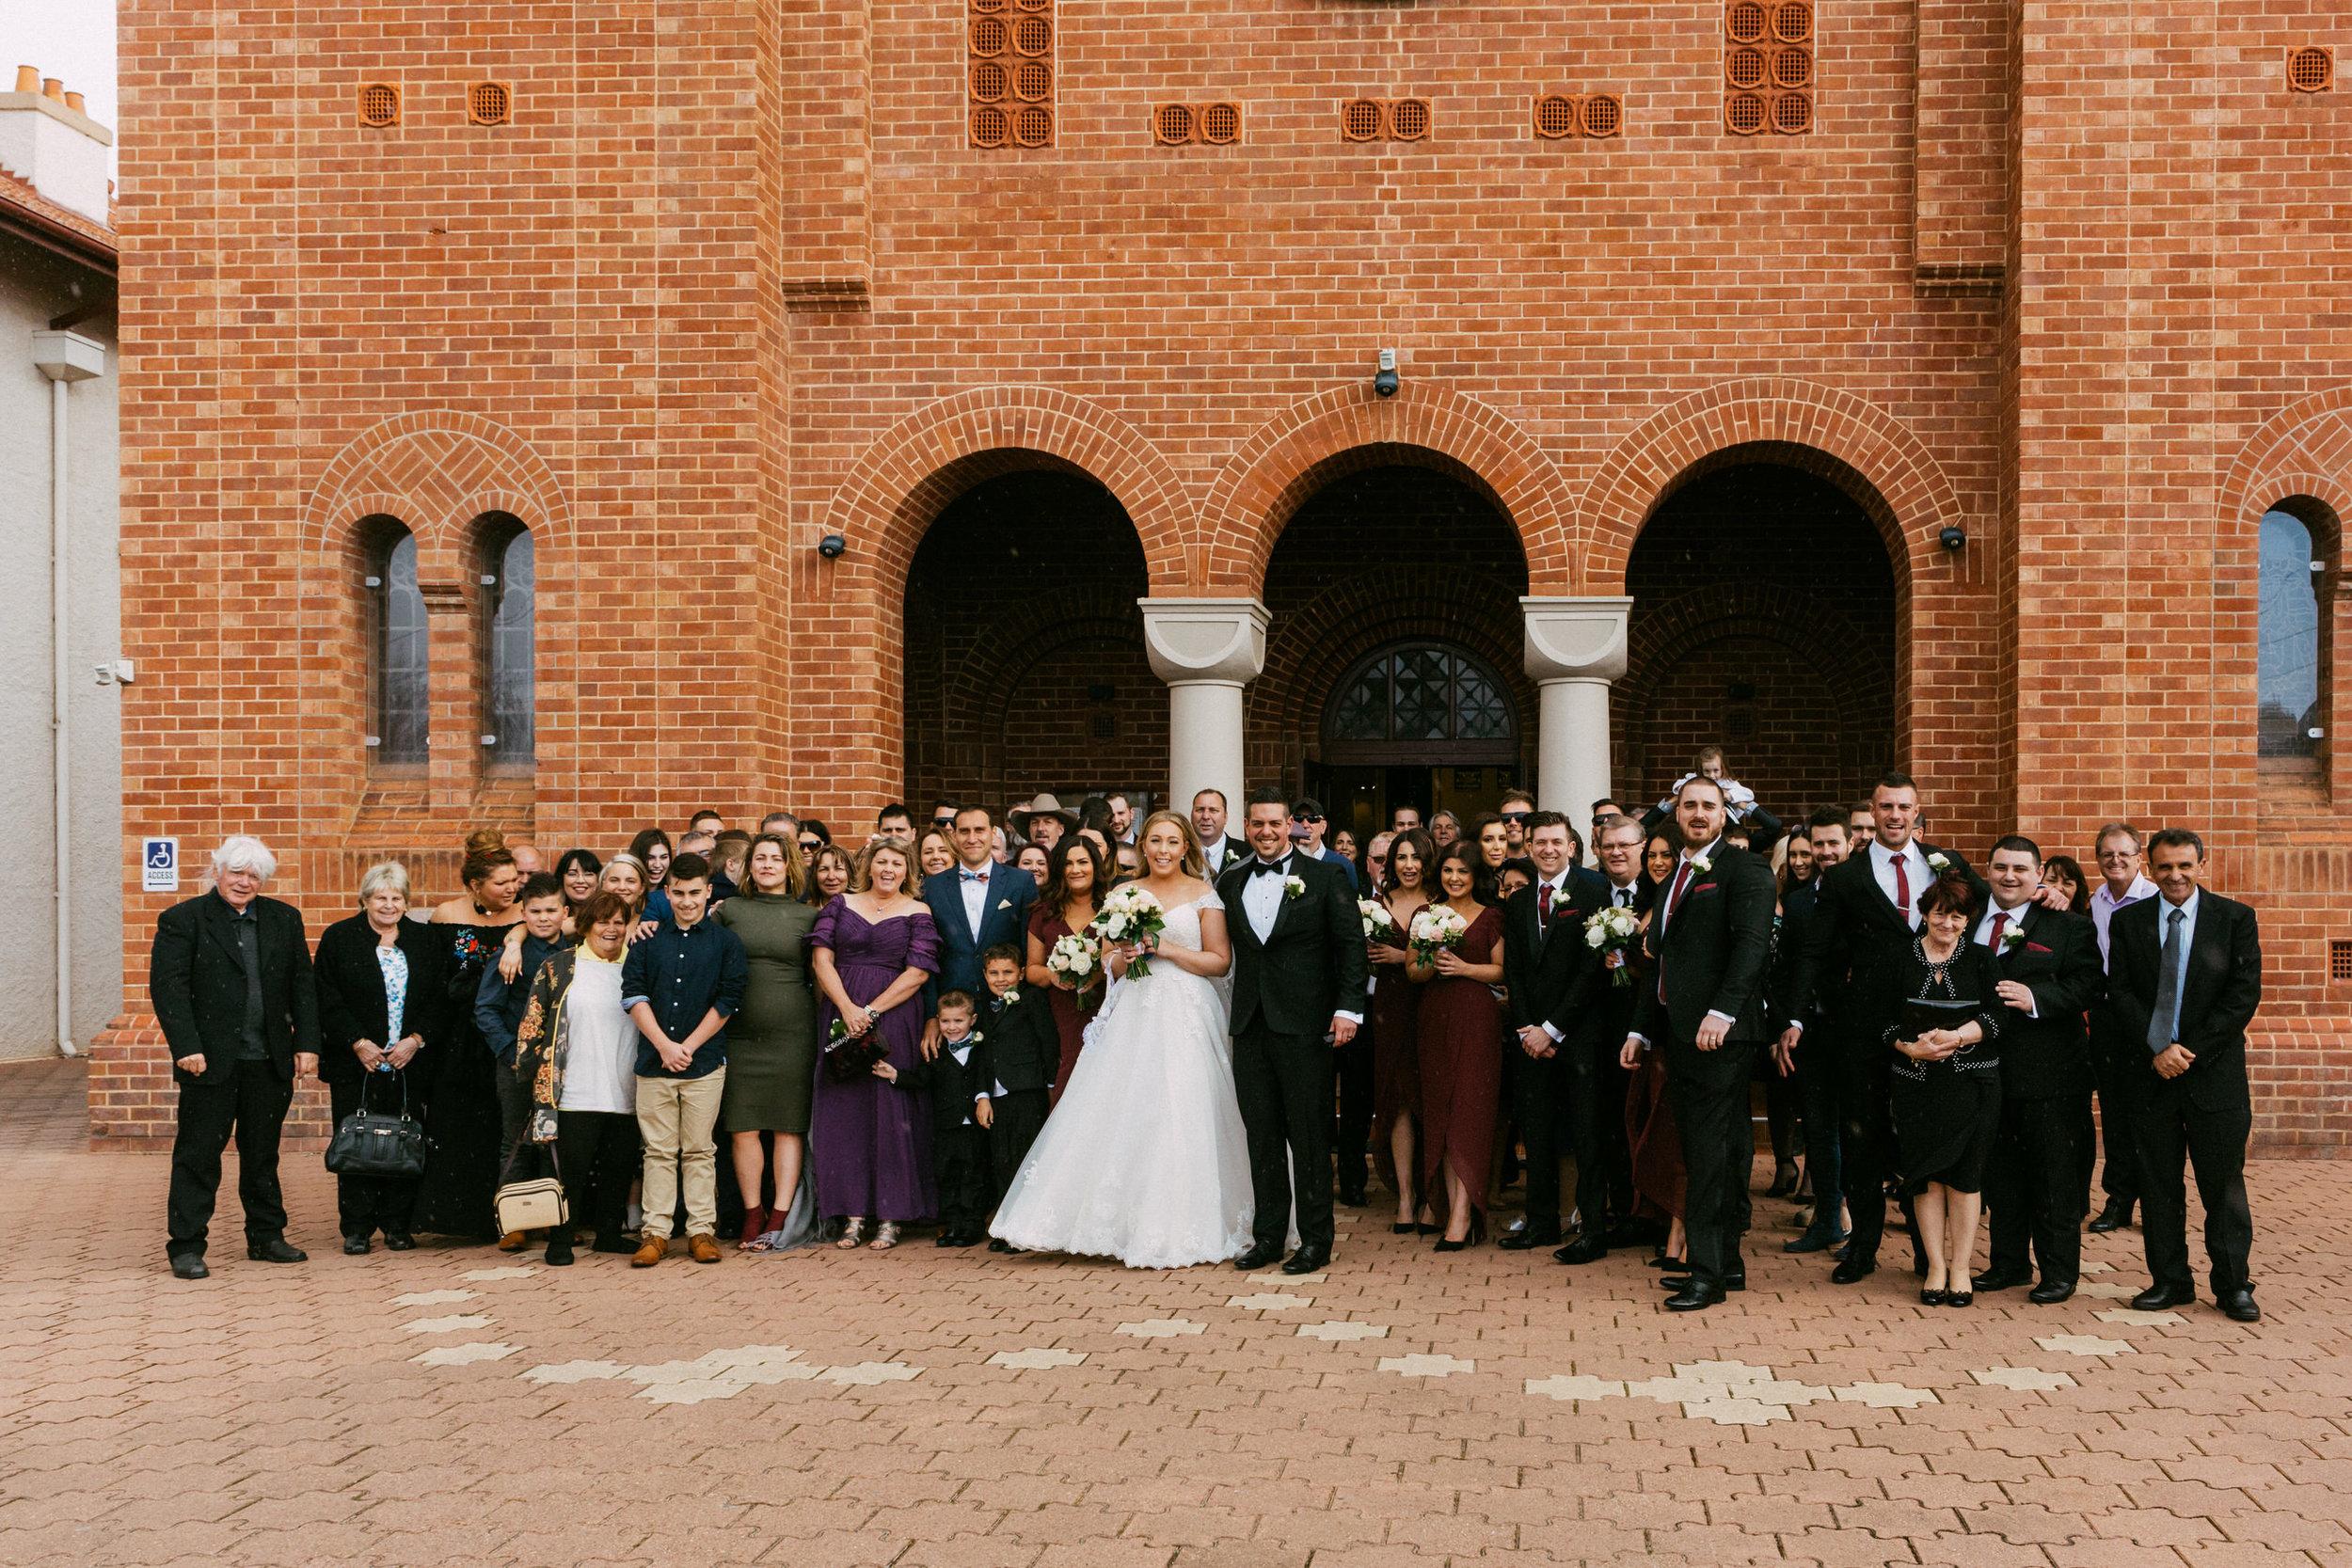 Adelaide Wedding Church Smoke Bomb Serafino 080.jpg